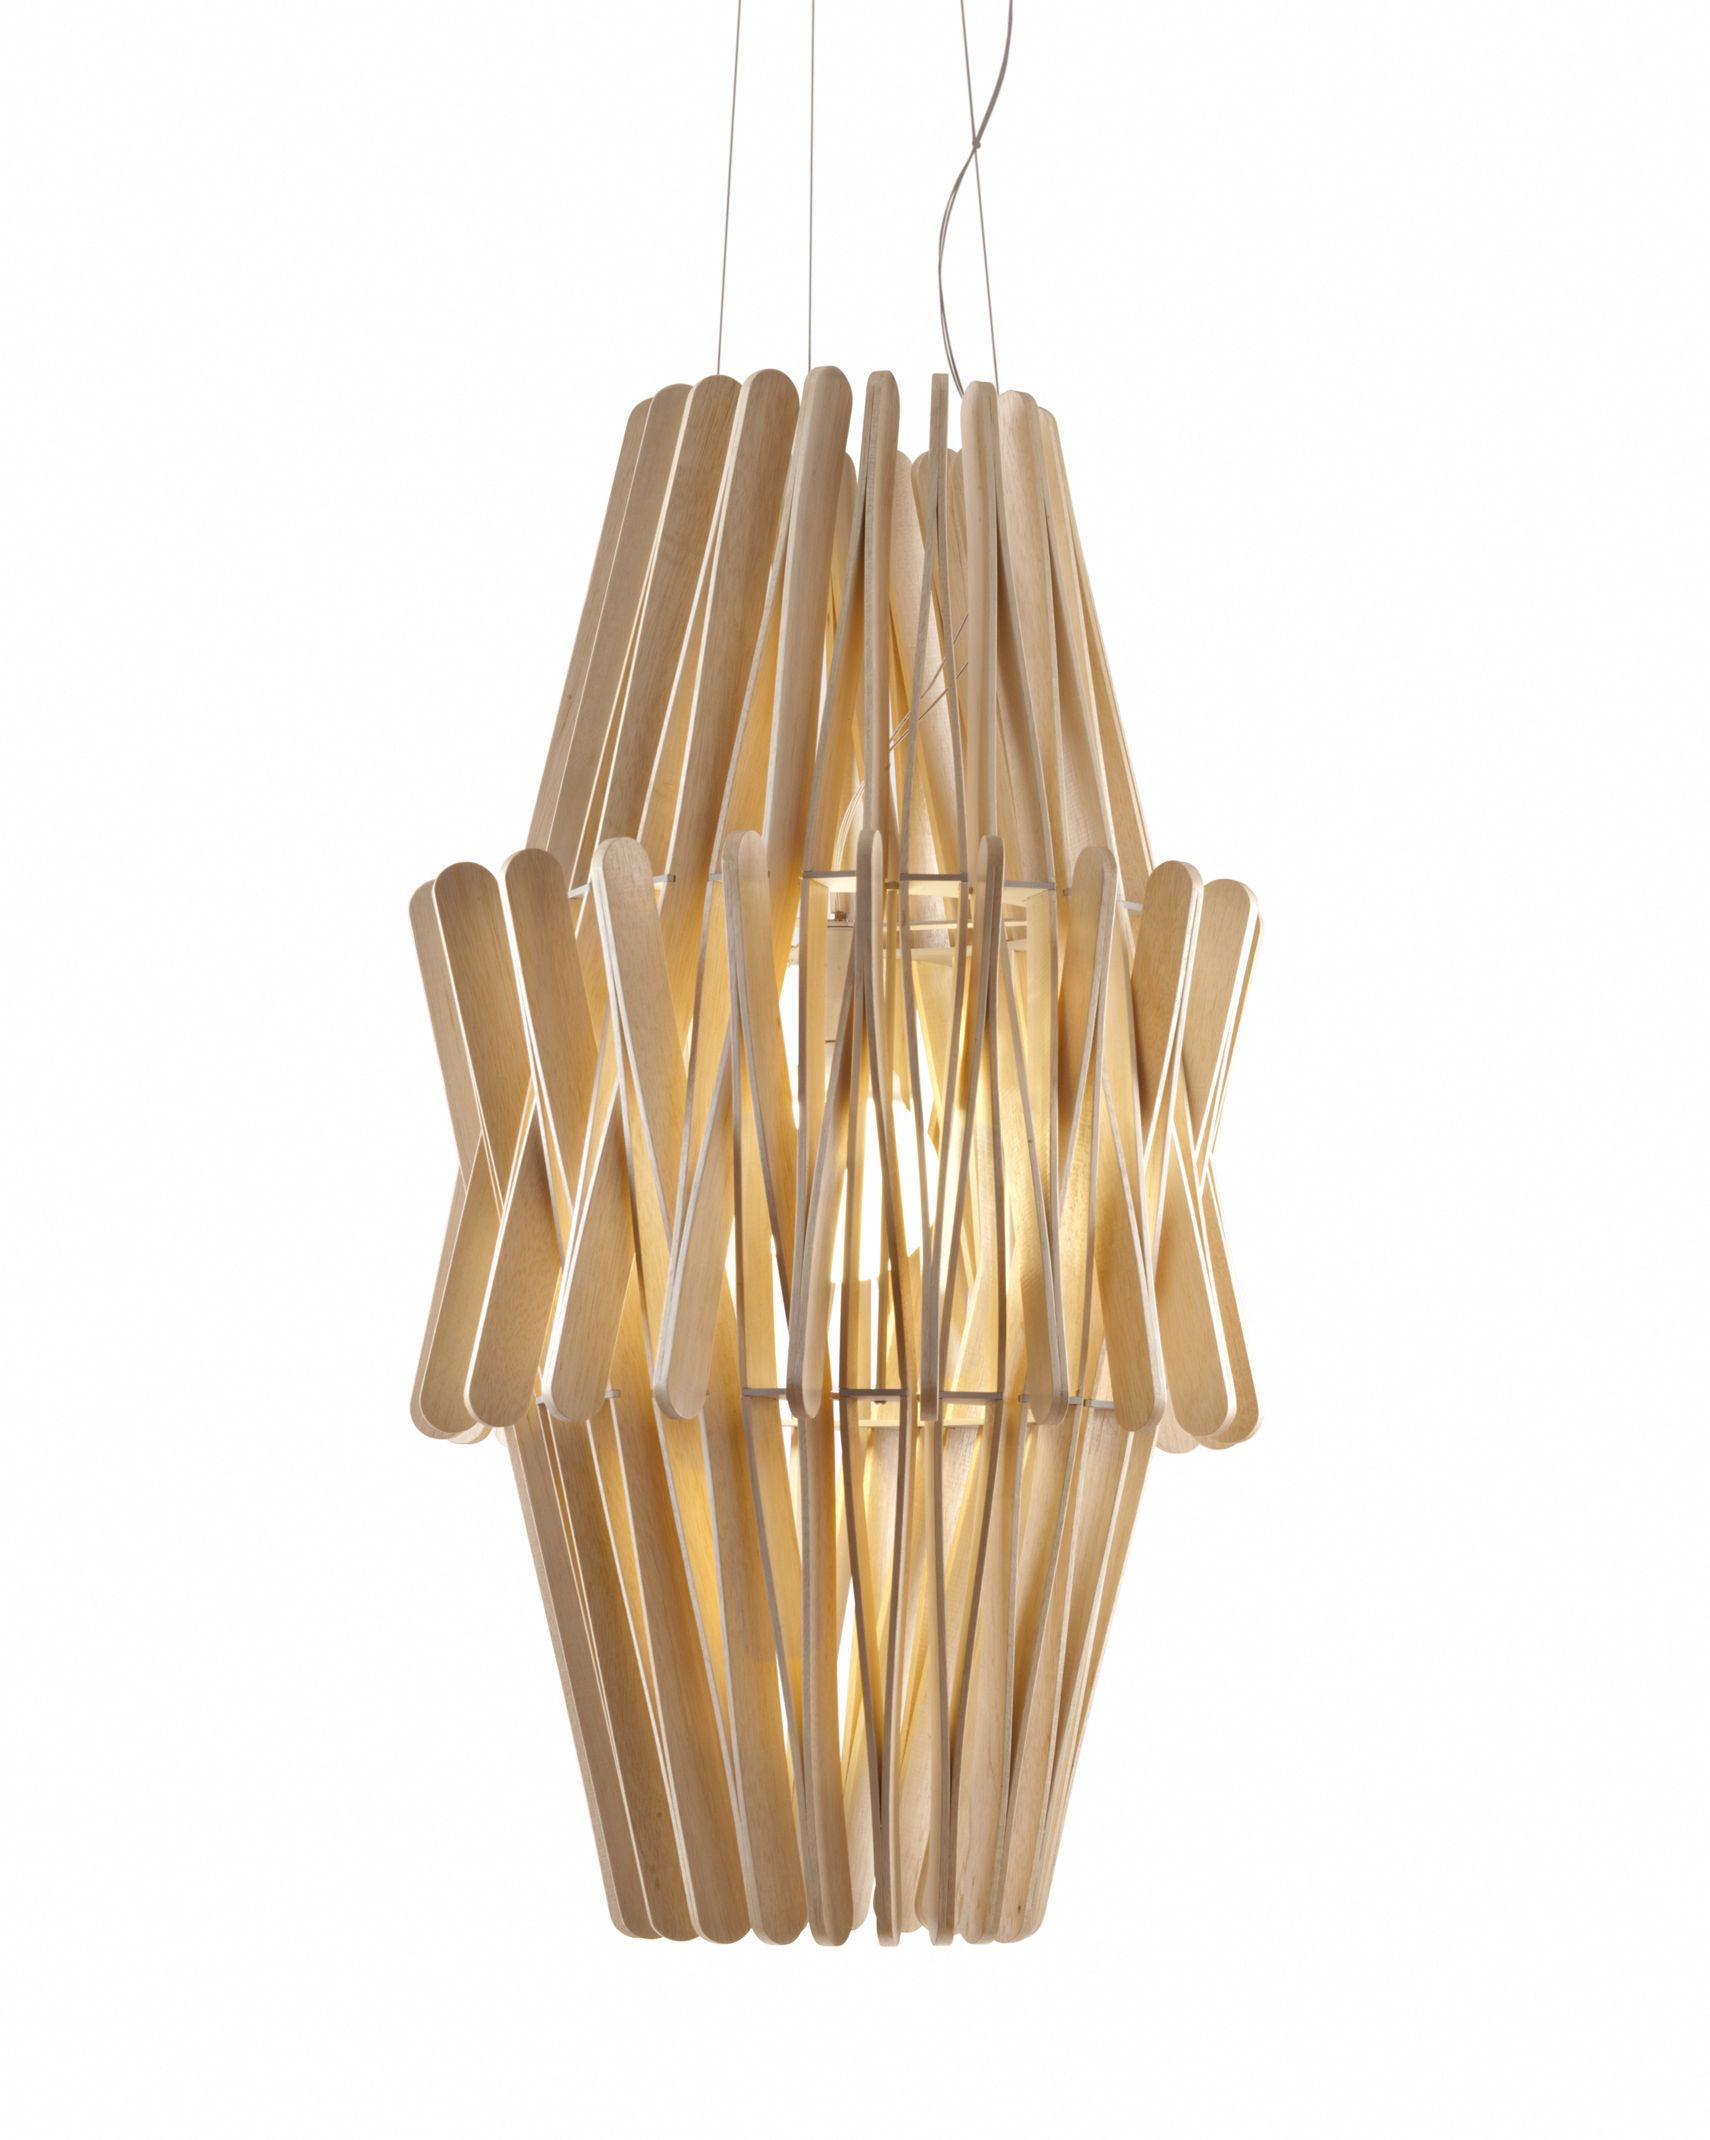 suspension stick 05 50 x h 97 cm bois clair fabbian. Black Bedroom Furniture Sets. Home Design Ideas